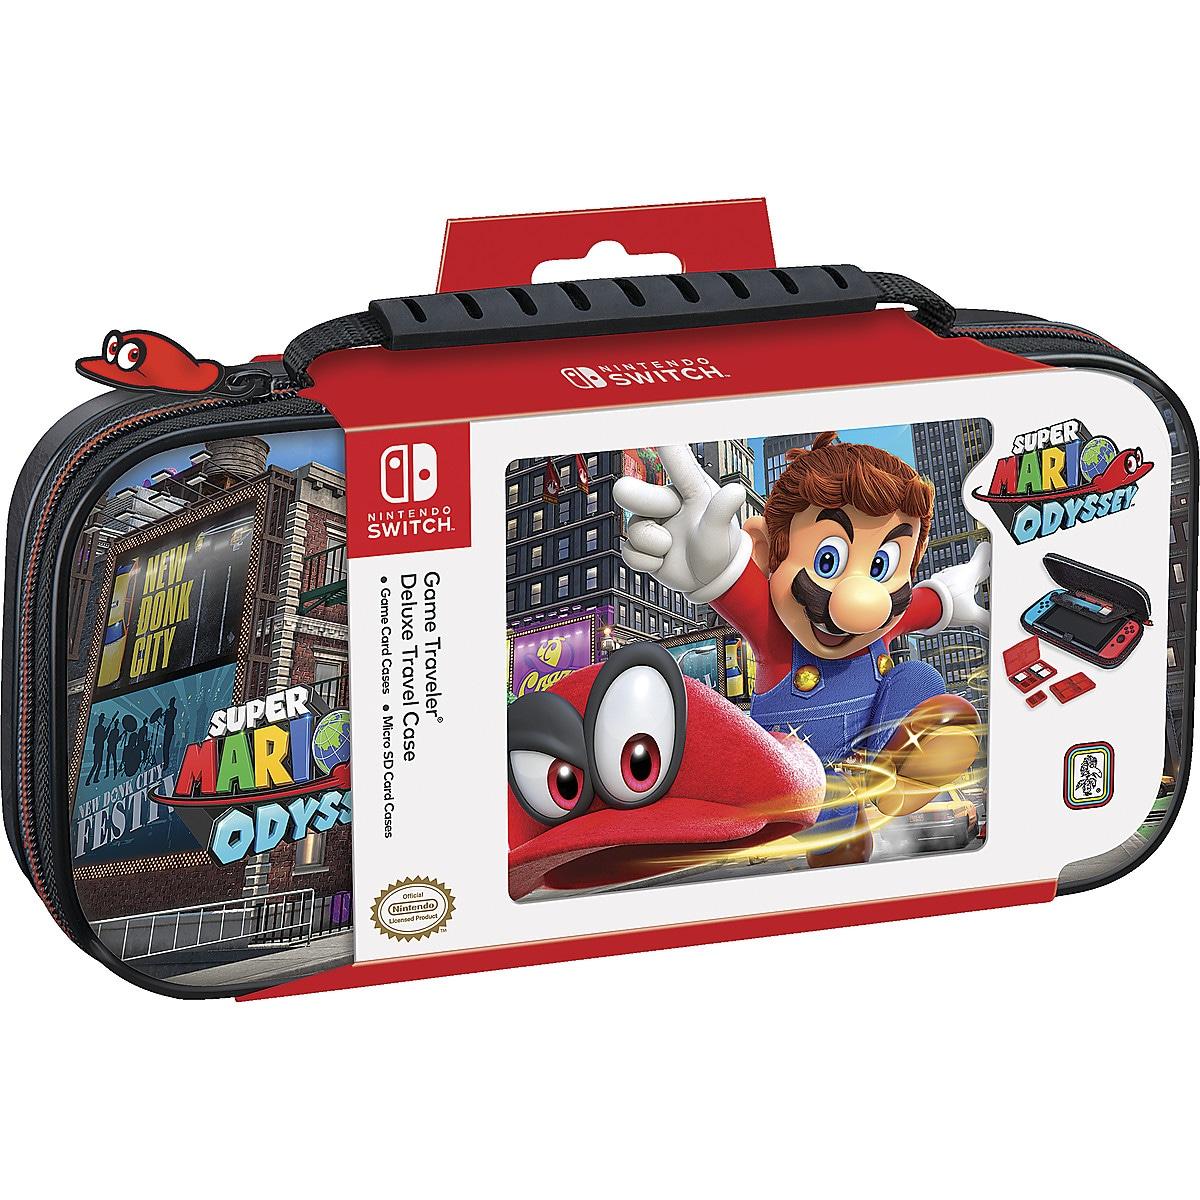 Väska, Nintendo Switch Deluxe Travel Case Super Mario Odyssey